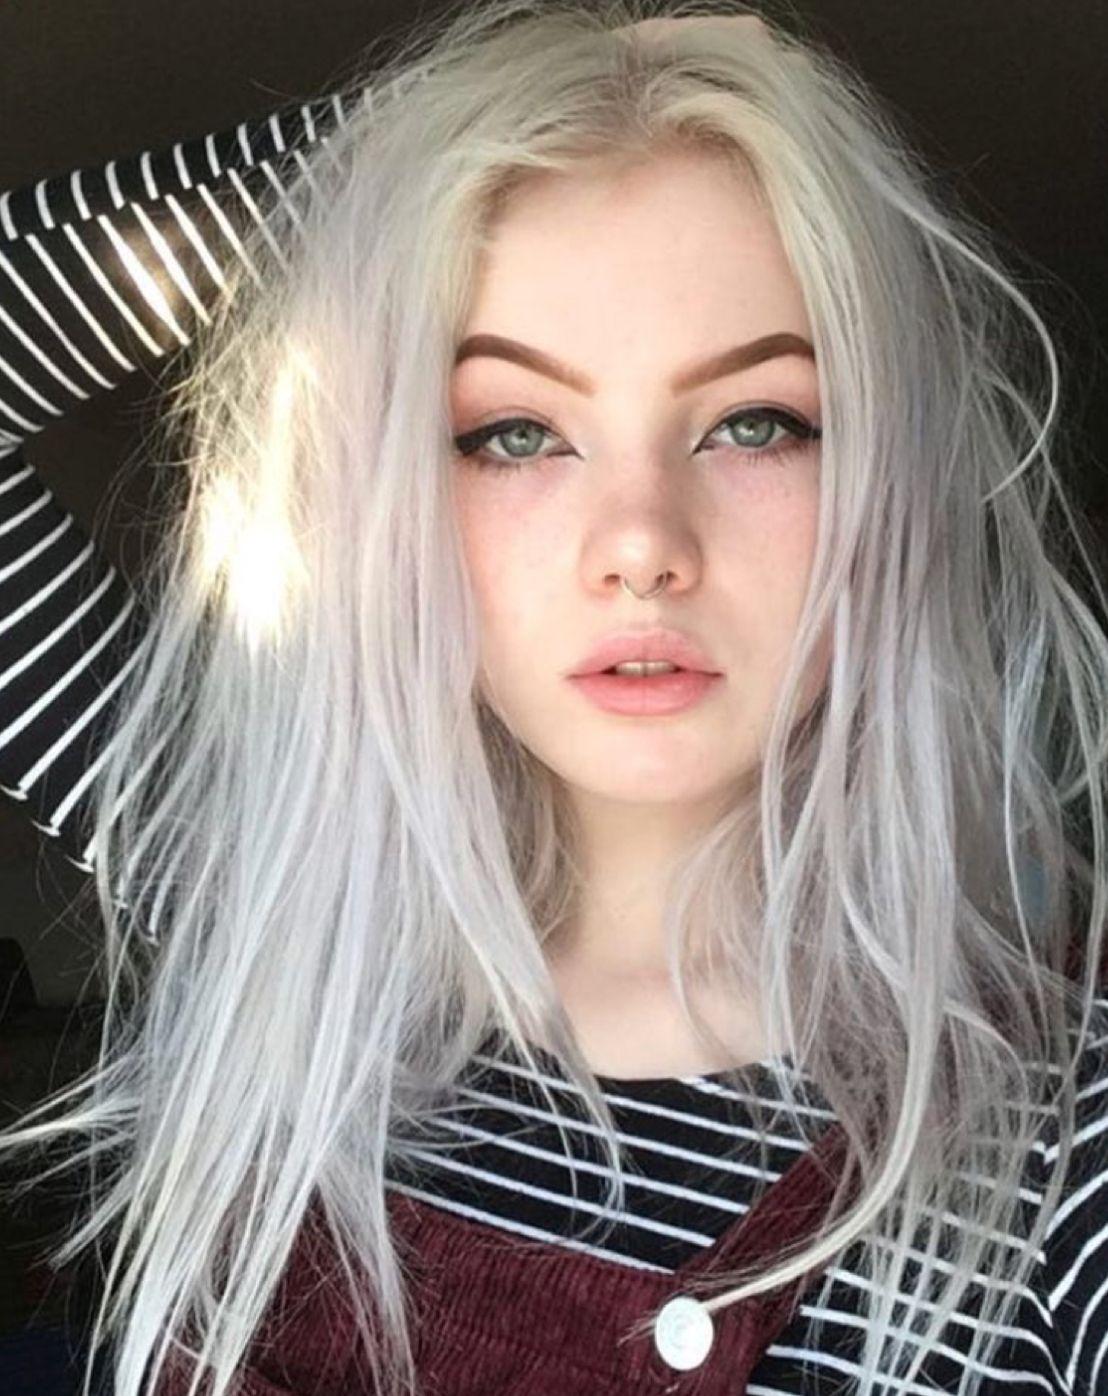 pin by uwusky. 🥰 on goalѕ in 2019 | messy hair look, hair